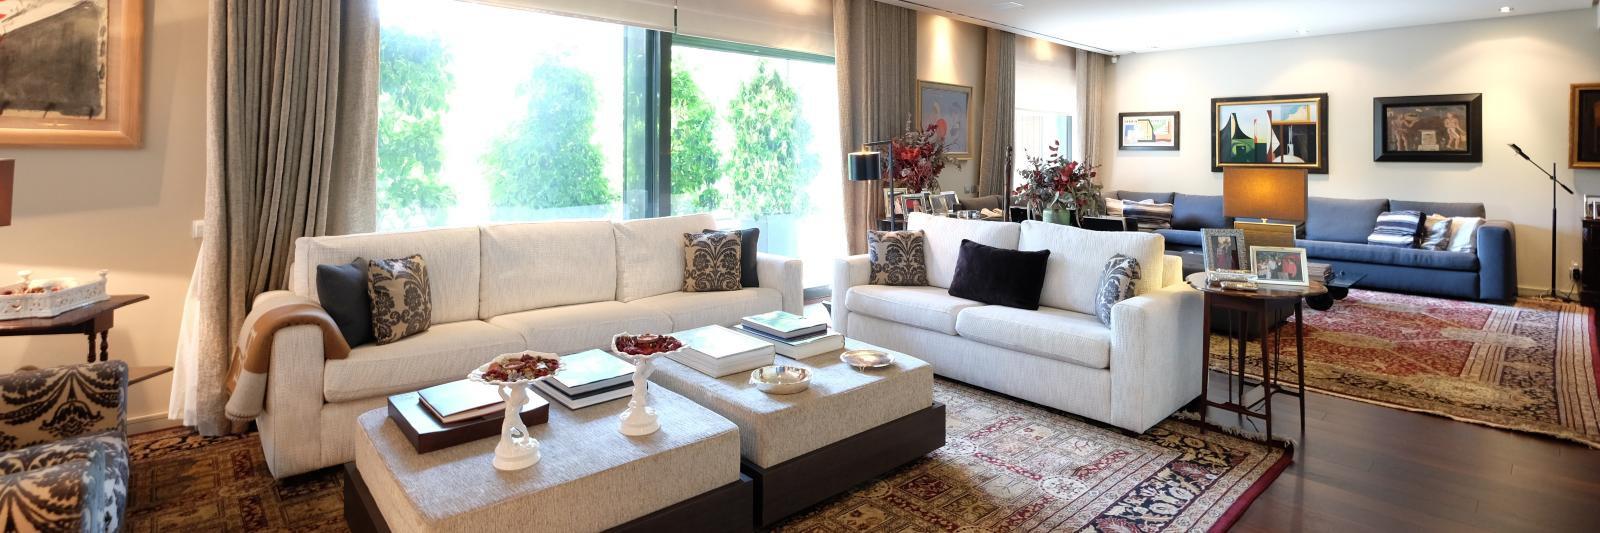 MG Inmobiliaria Barcelona - zona-alta-bonanova-889